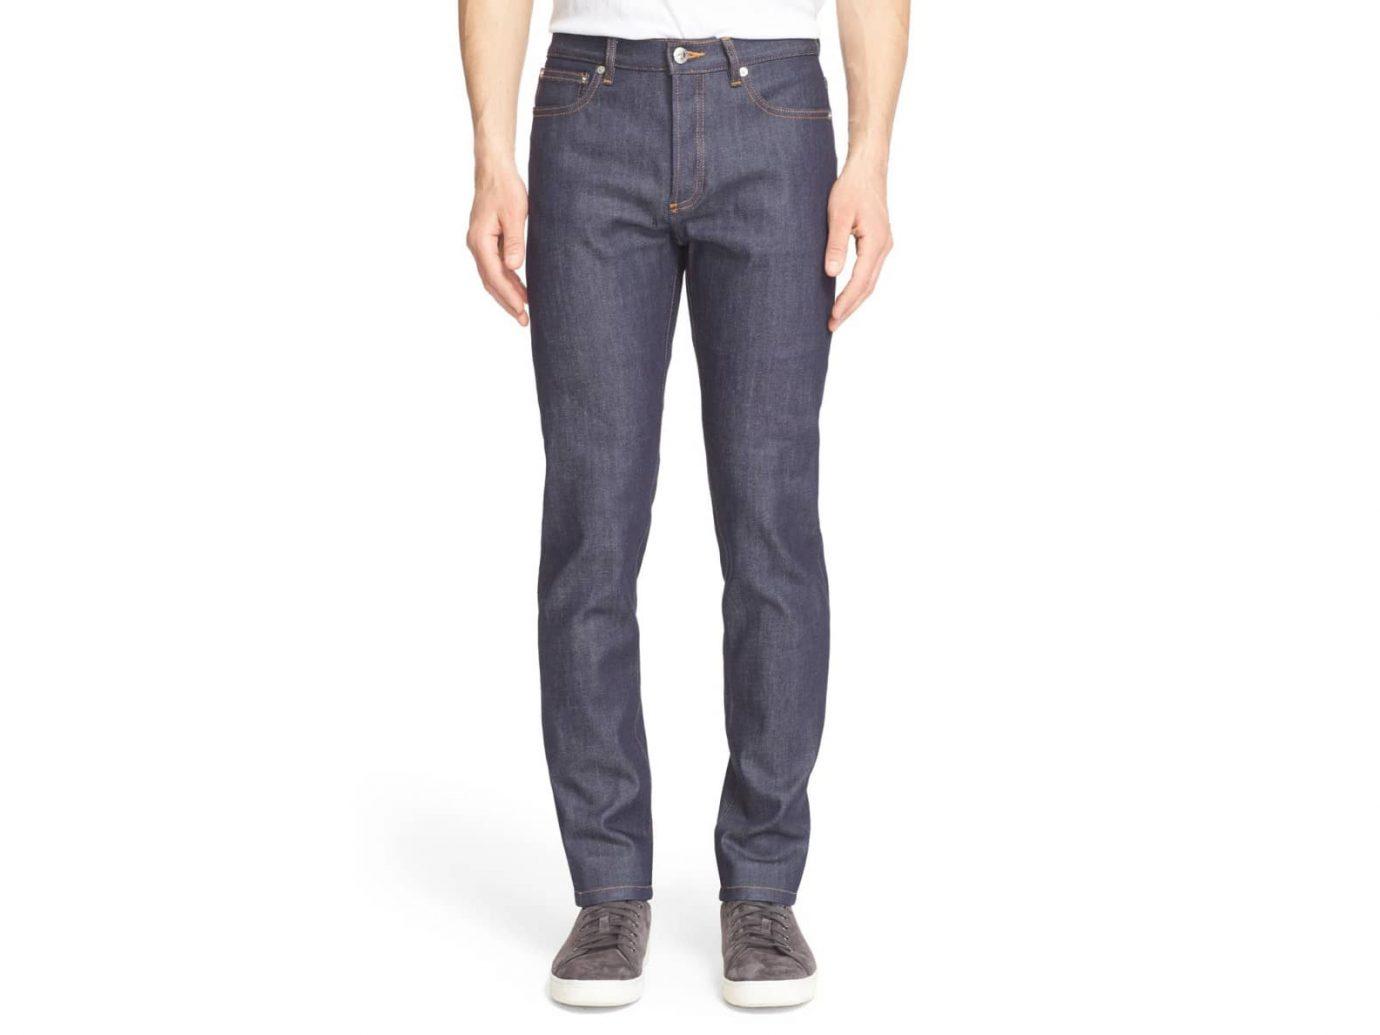 A.P.C. Petite New Standard Skinny Fit Jeans